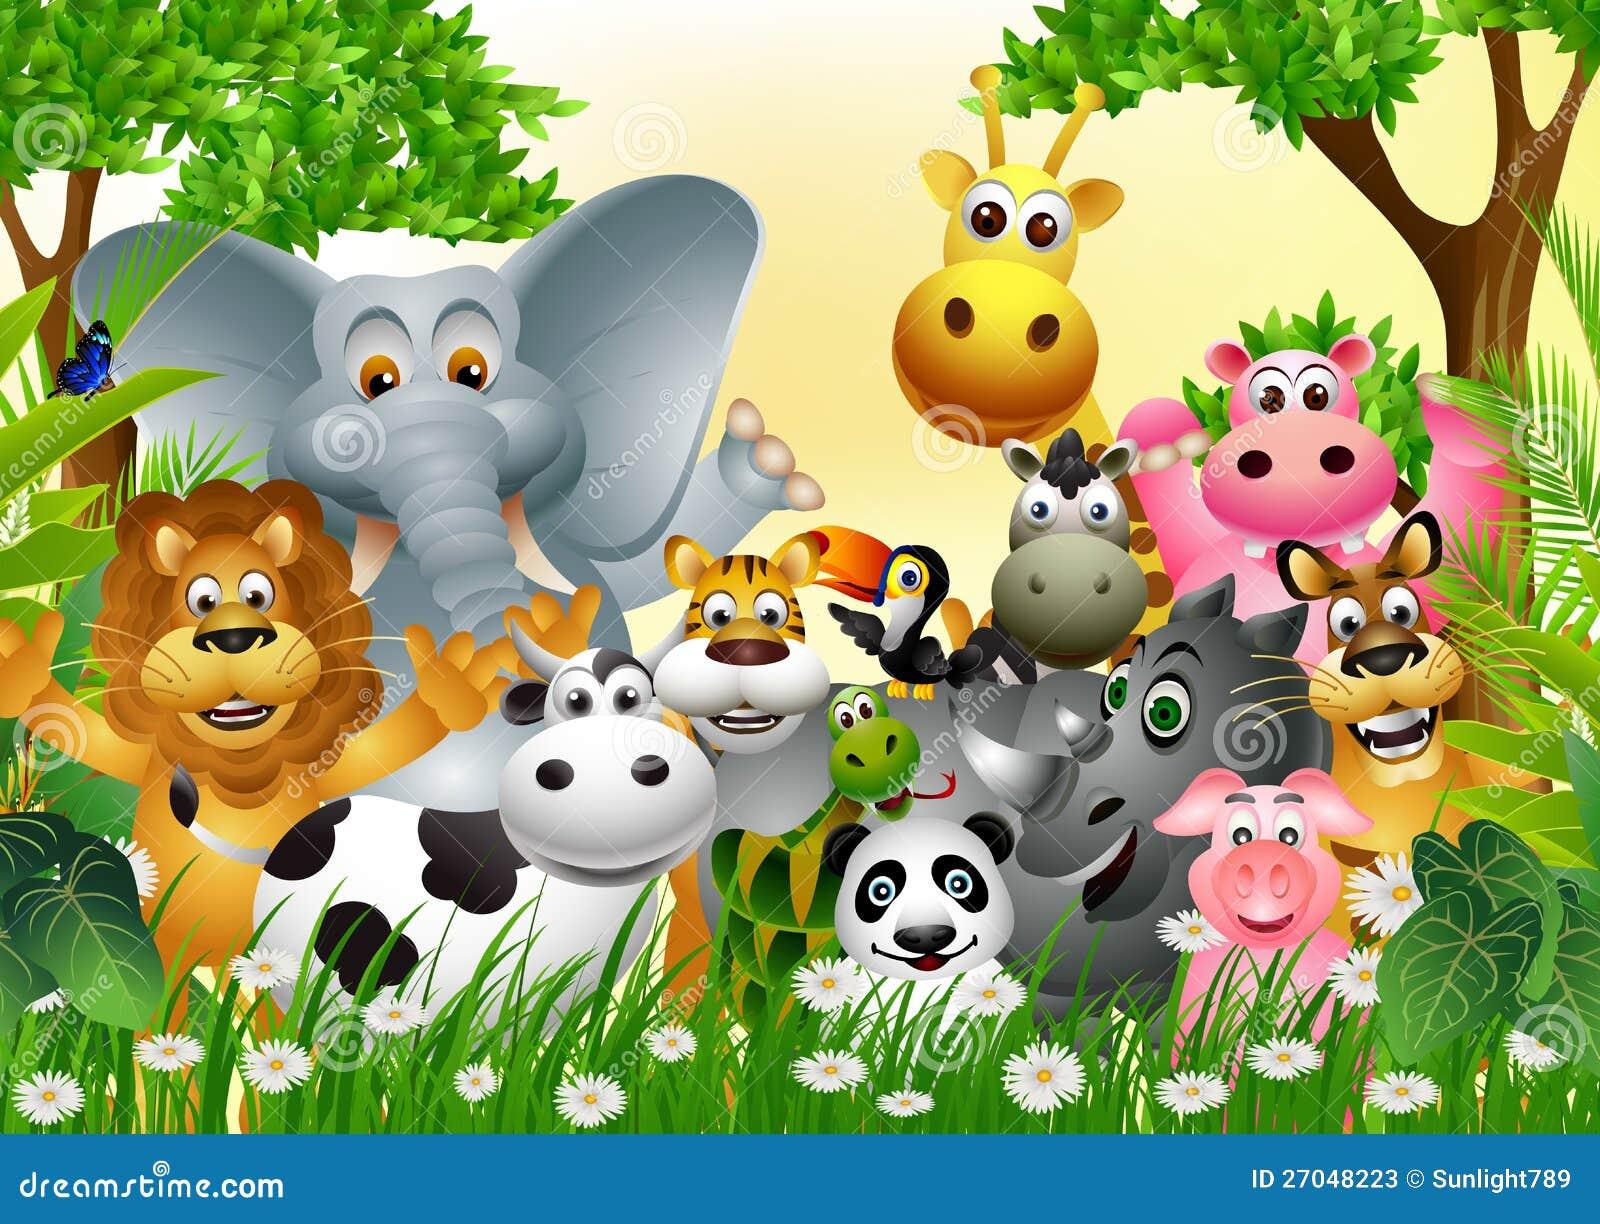 Colecao Animal Engracada Dos Desenhos Animados Dos Animais